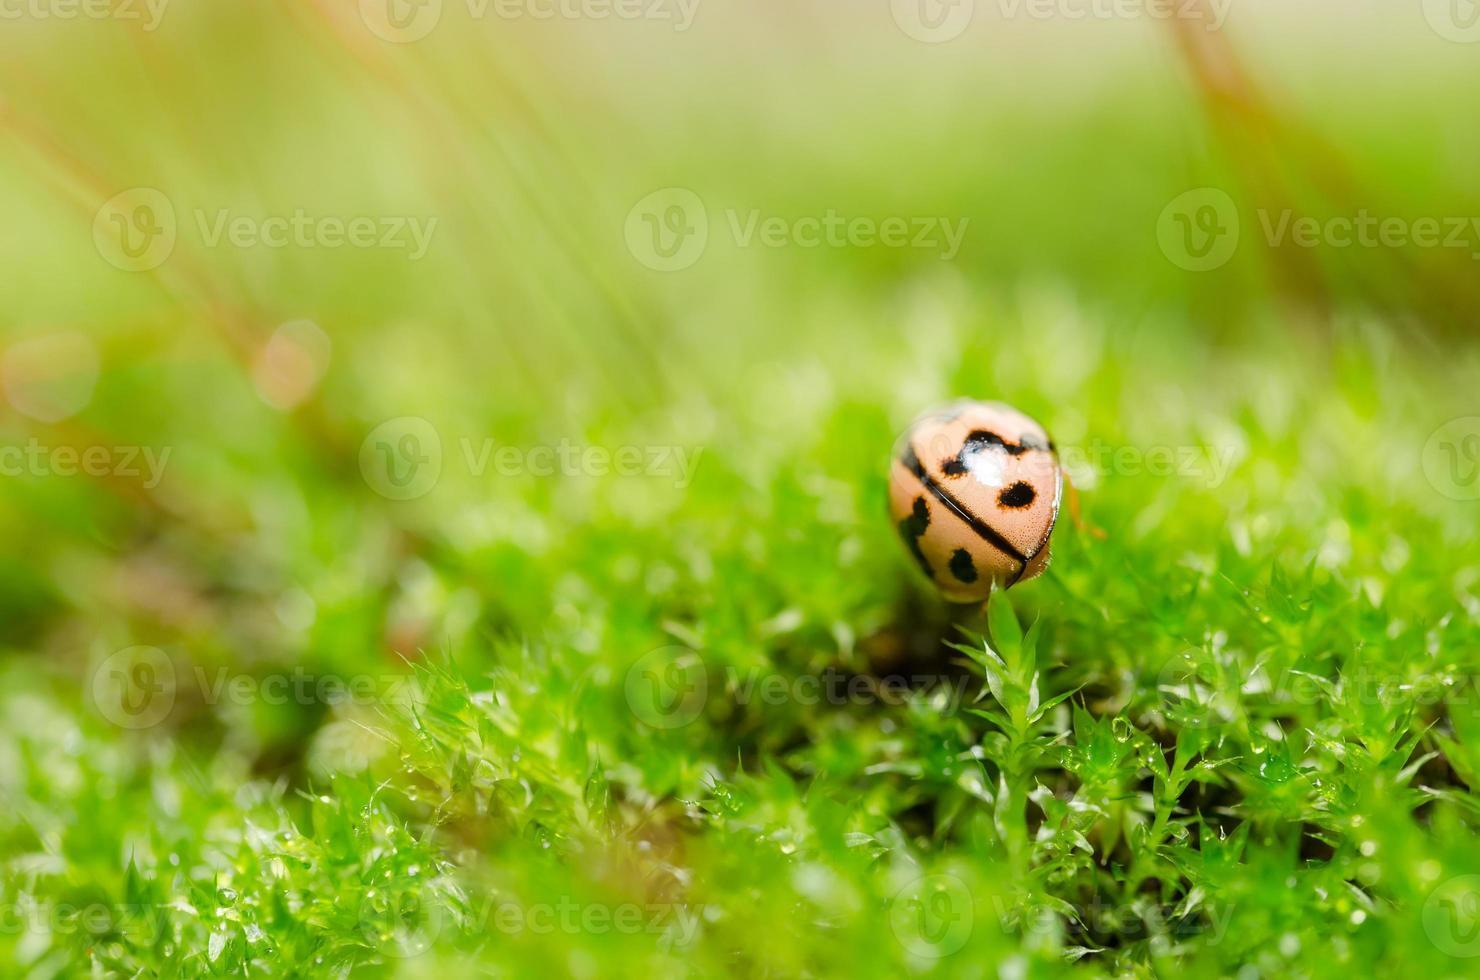 joaninha na natureza verde foto